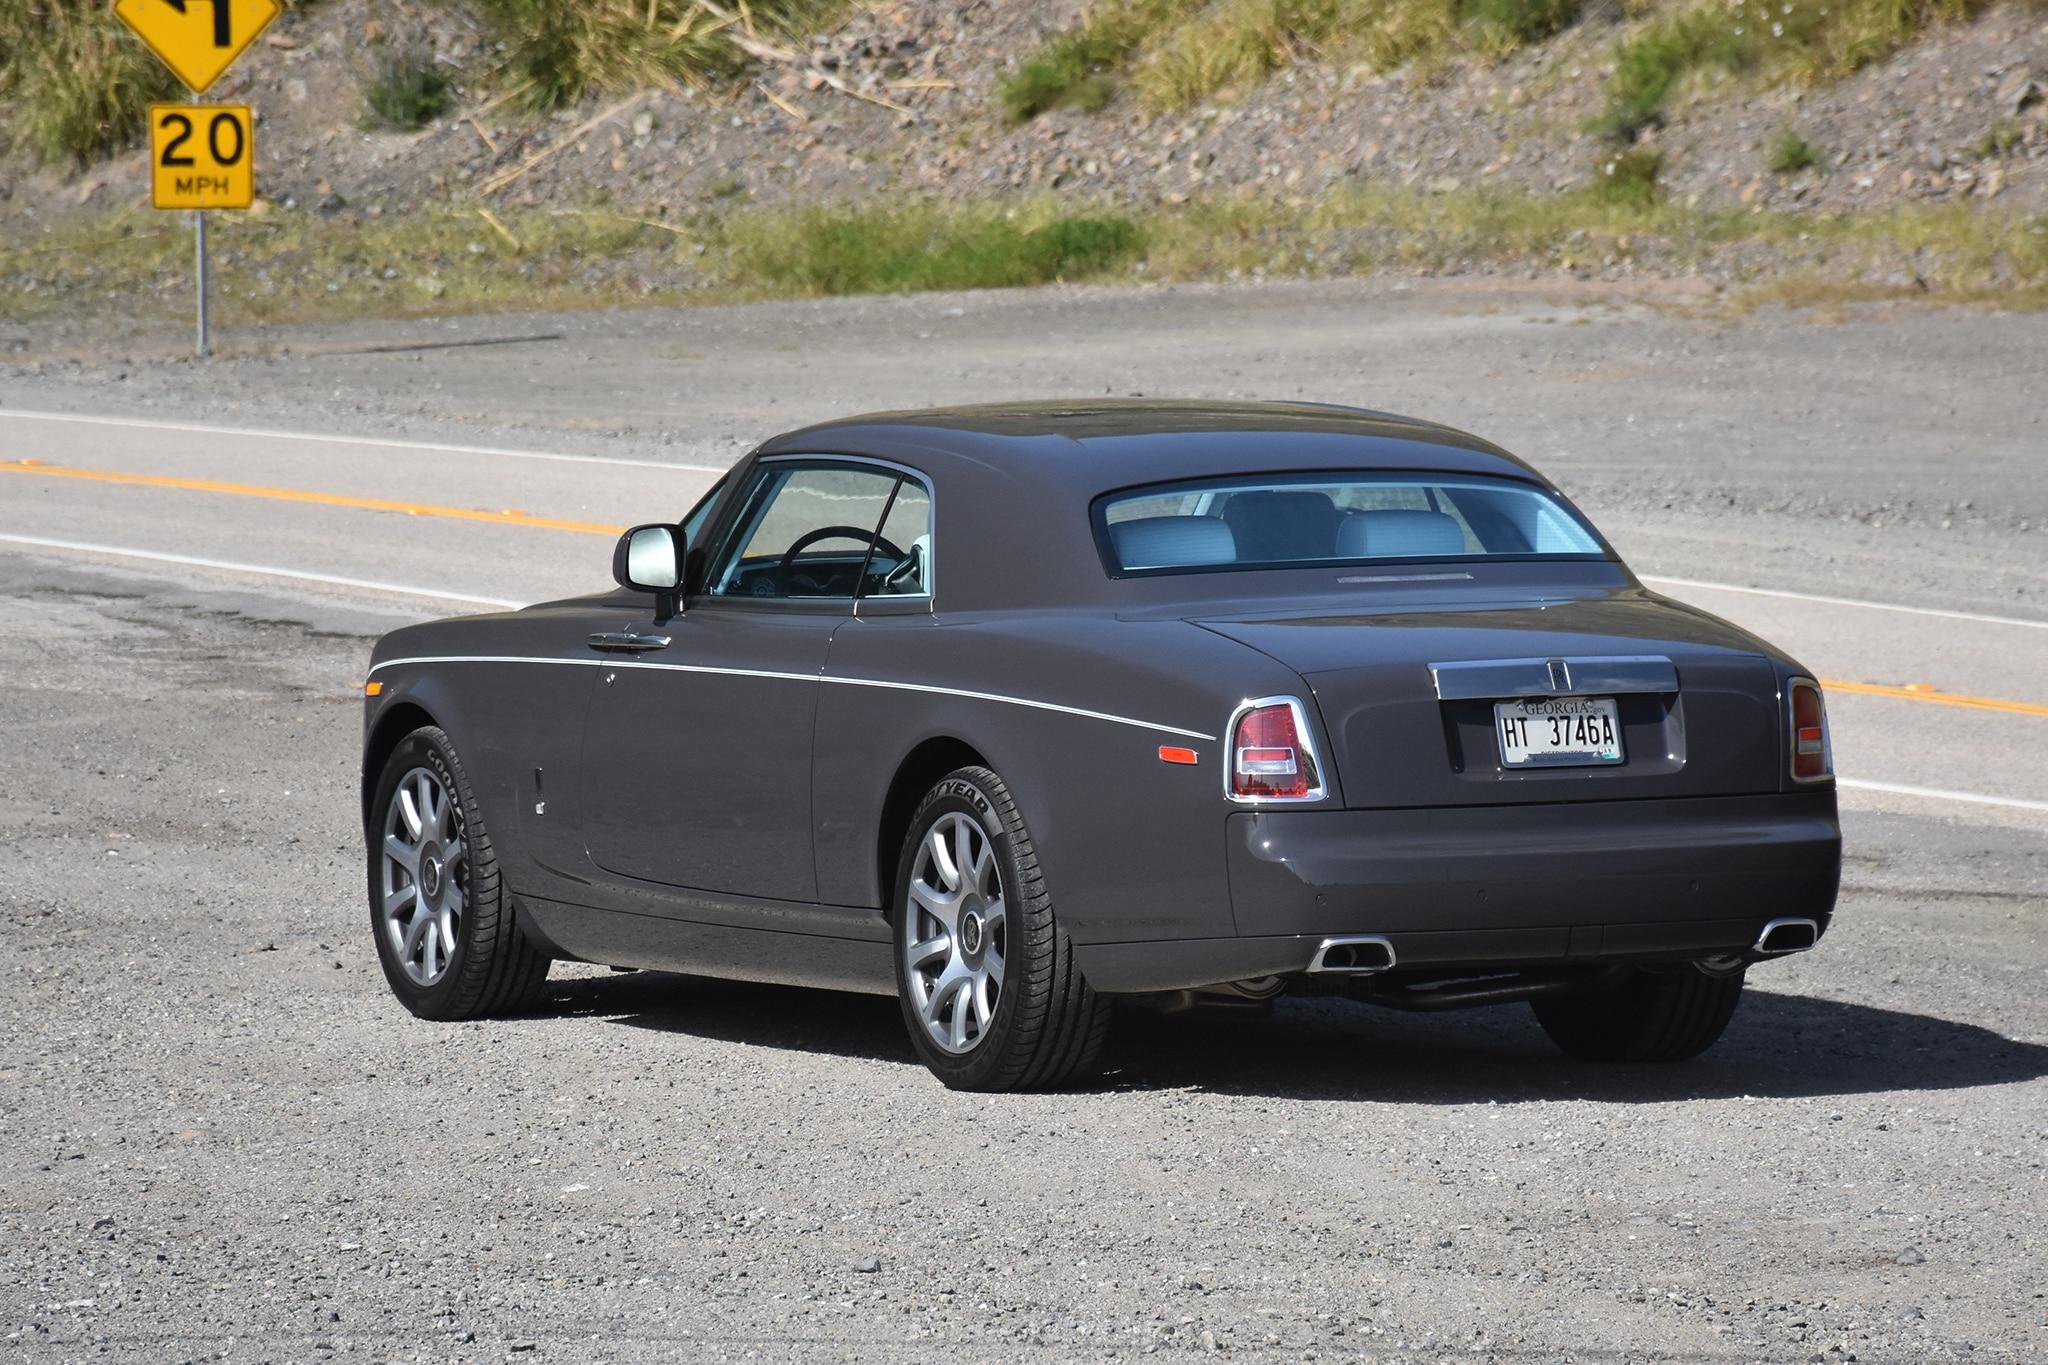 rolls royce phantom coupe - photo #29